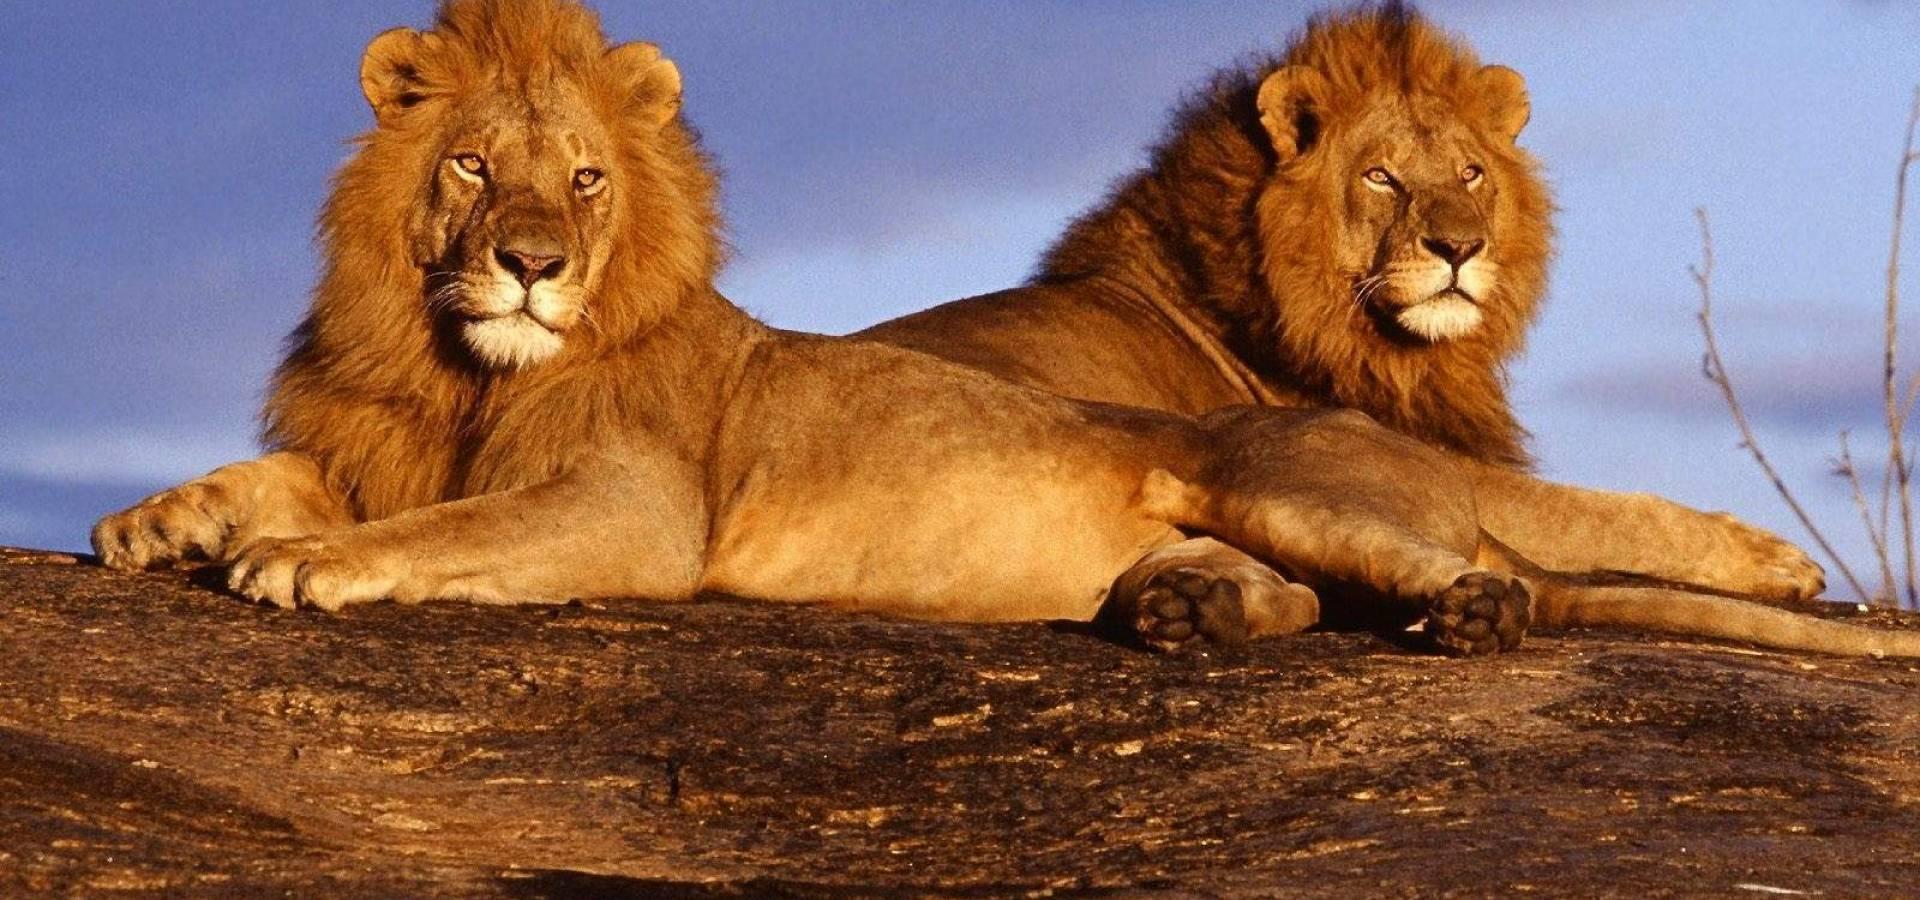 Leones en Maasai Mara